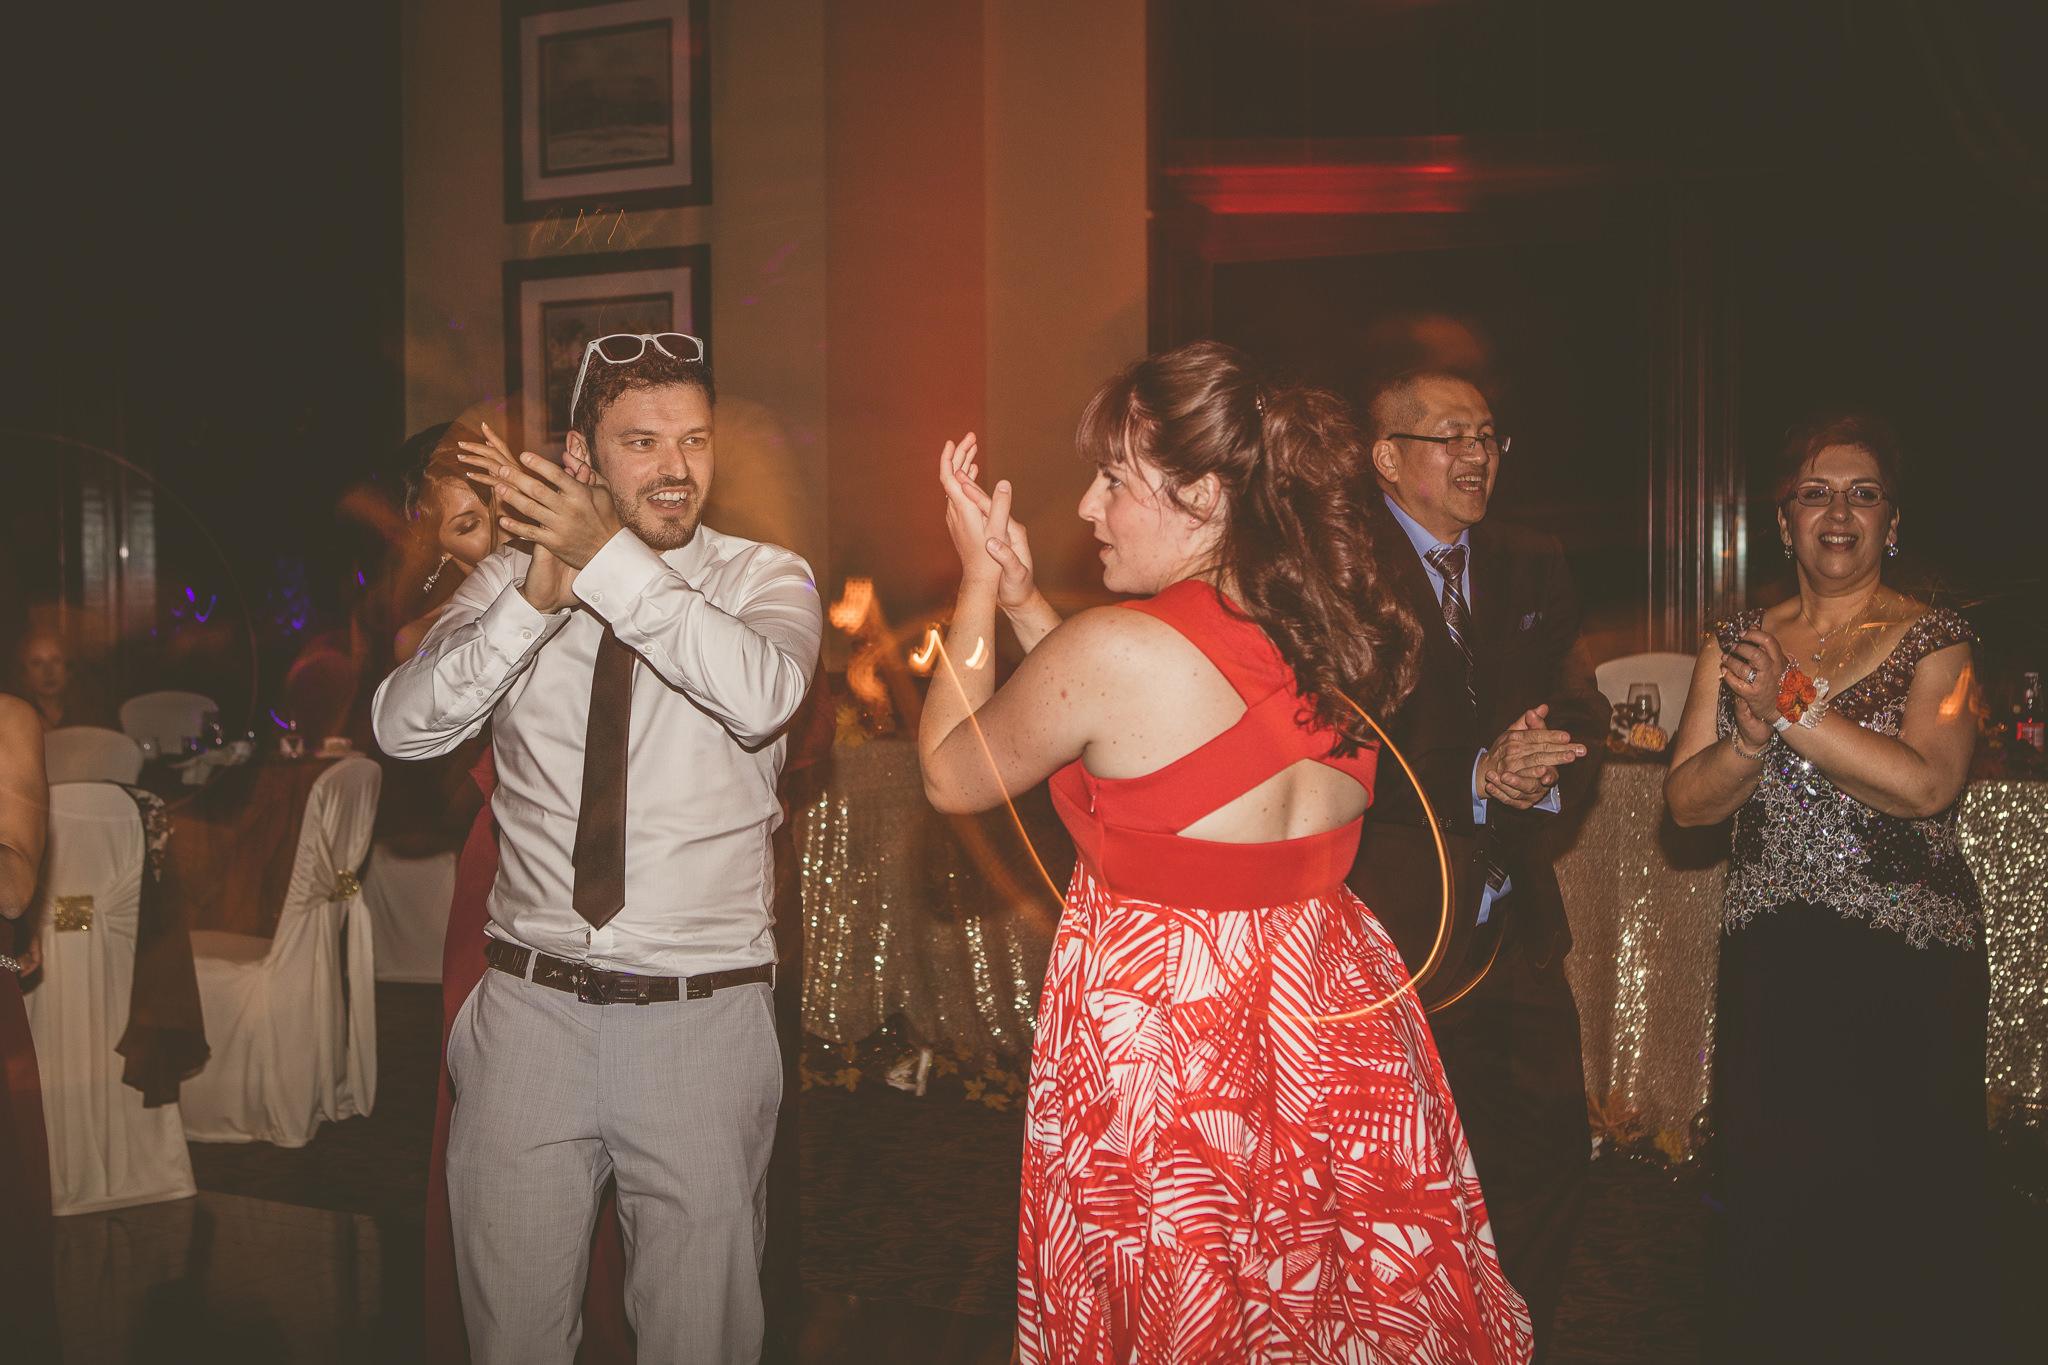 deer creek banquet facility wedding photos 812 - Deer Creek Wedding Photos